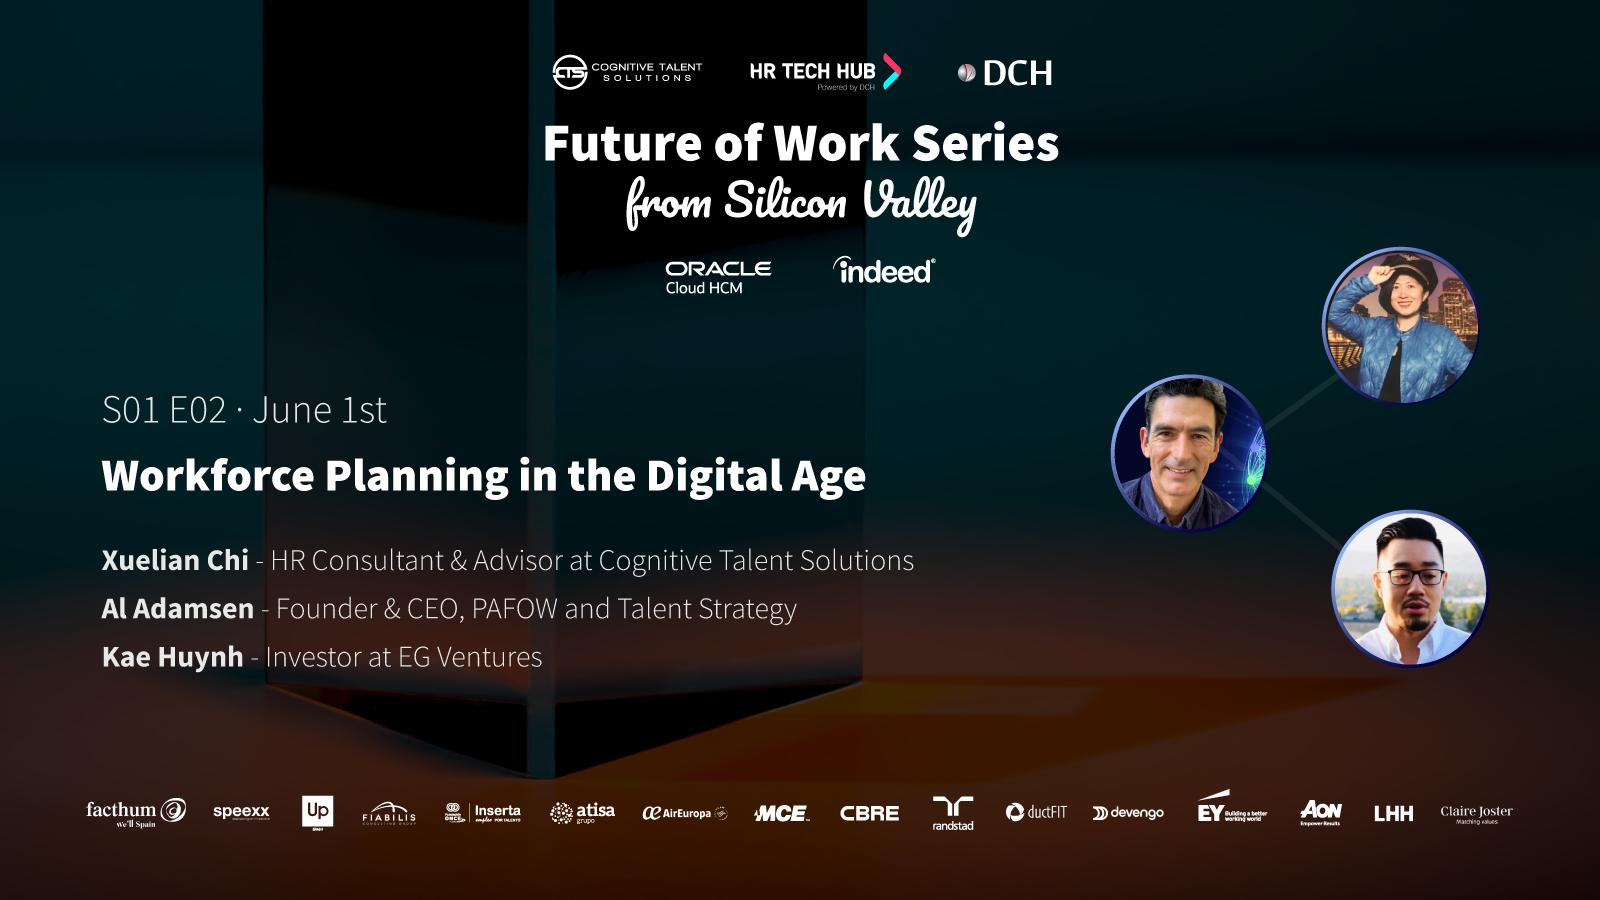 Cumbre Future of Work Series